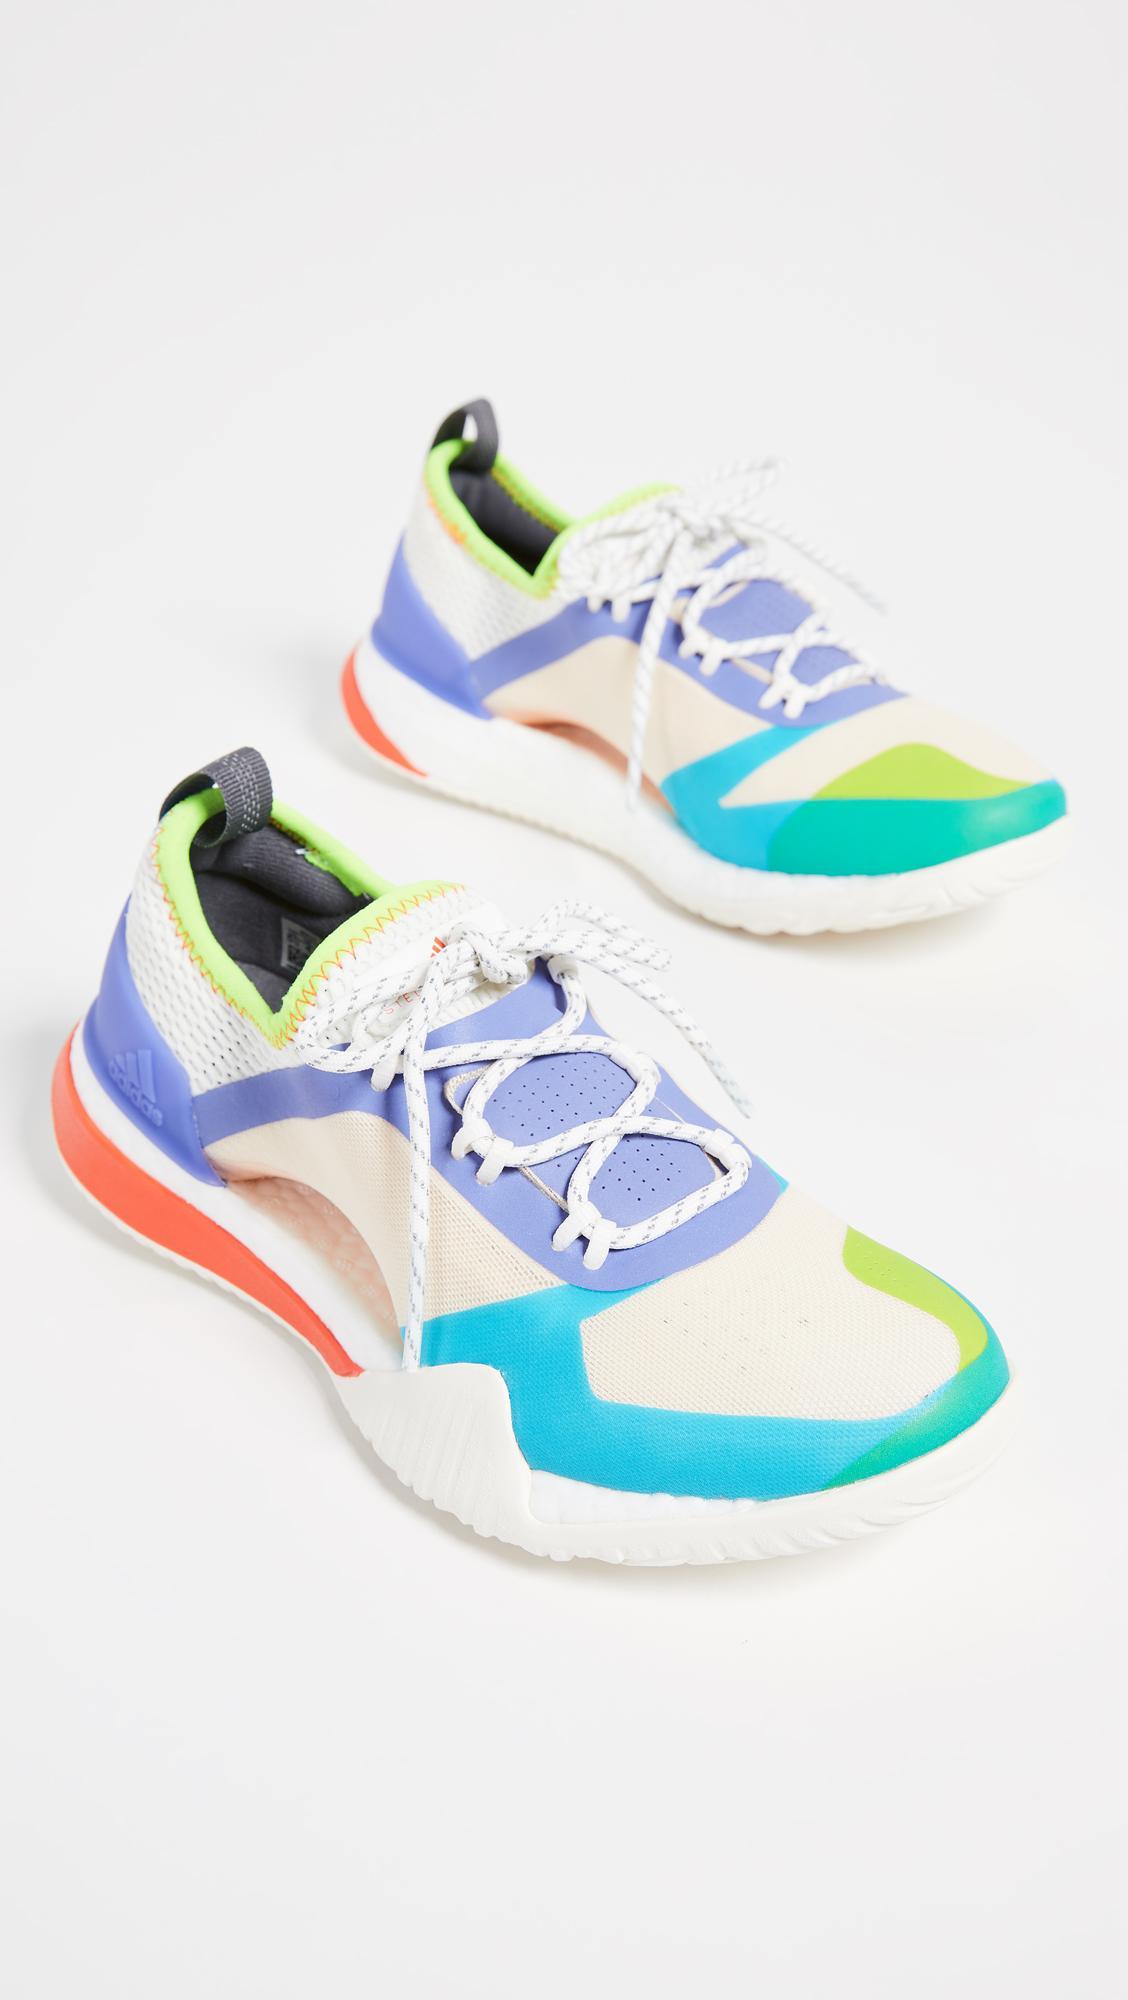 adidas By Stella McCartney Pureboost X Tr 3.0 Sneakers in Blue - Lyst 8ec99e1a2